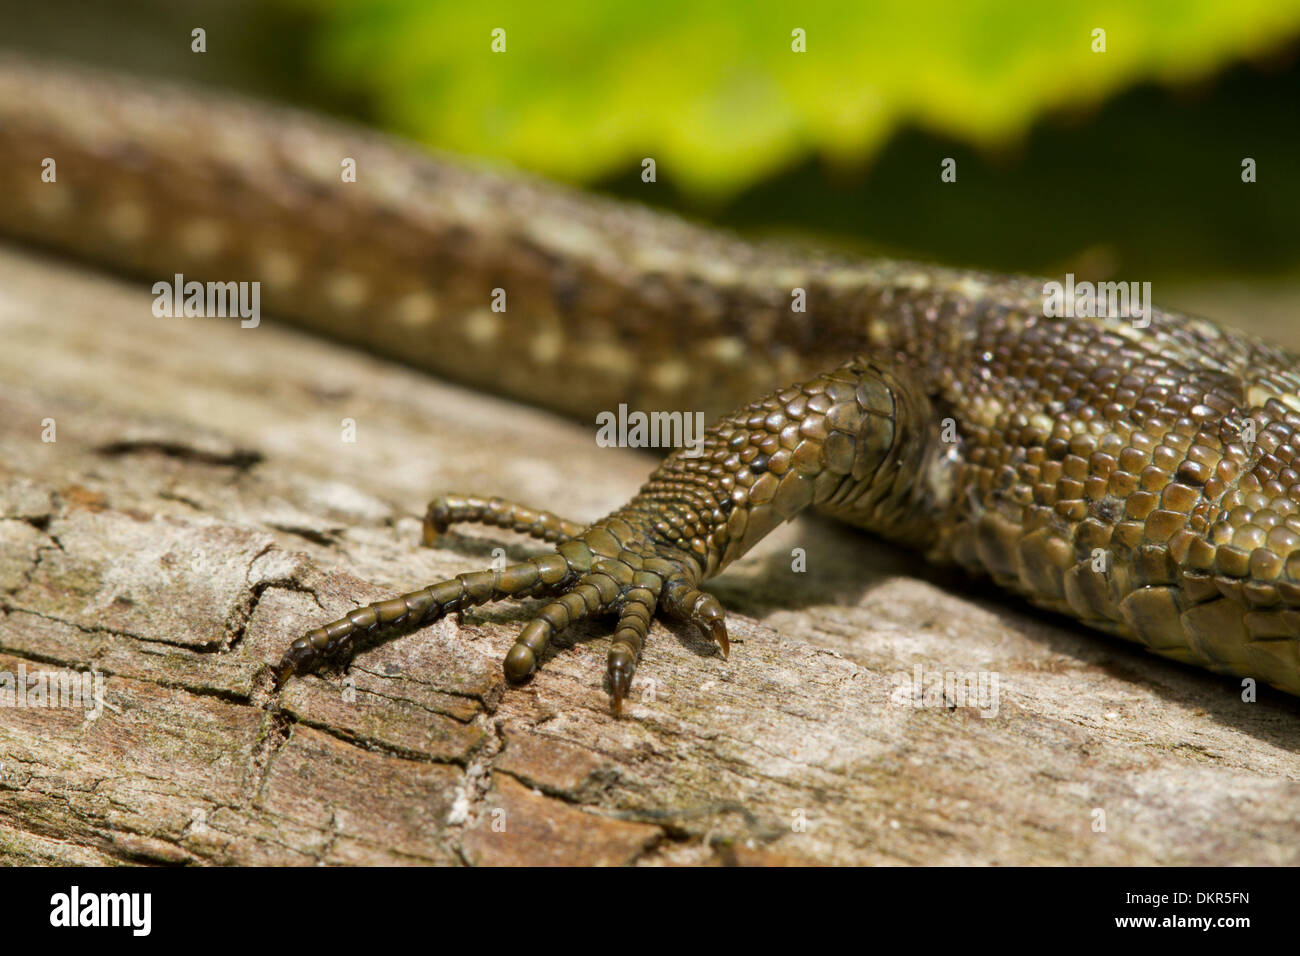 Common or Viviparous Lizard (Zootoca vivipara) close-up of the hind leg of an adult female basking on a log. Stock Photo